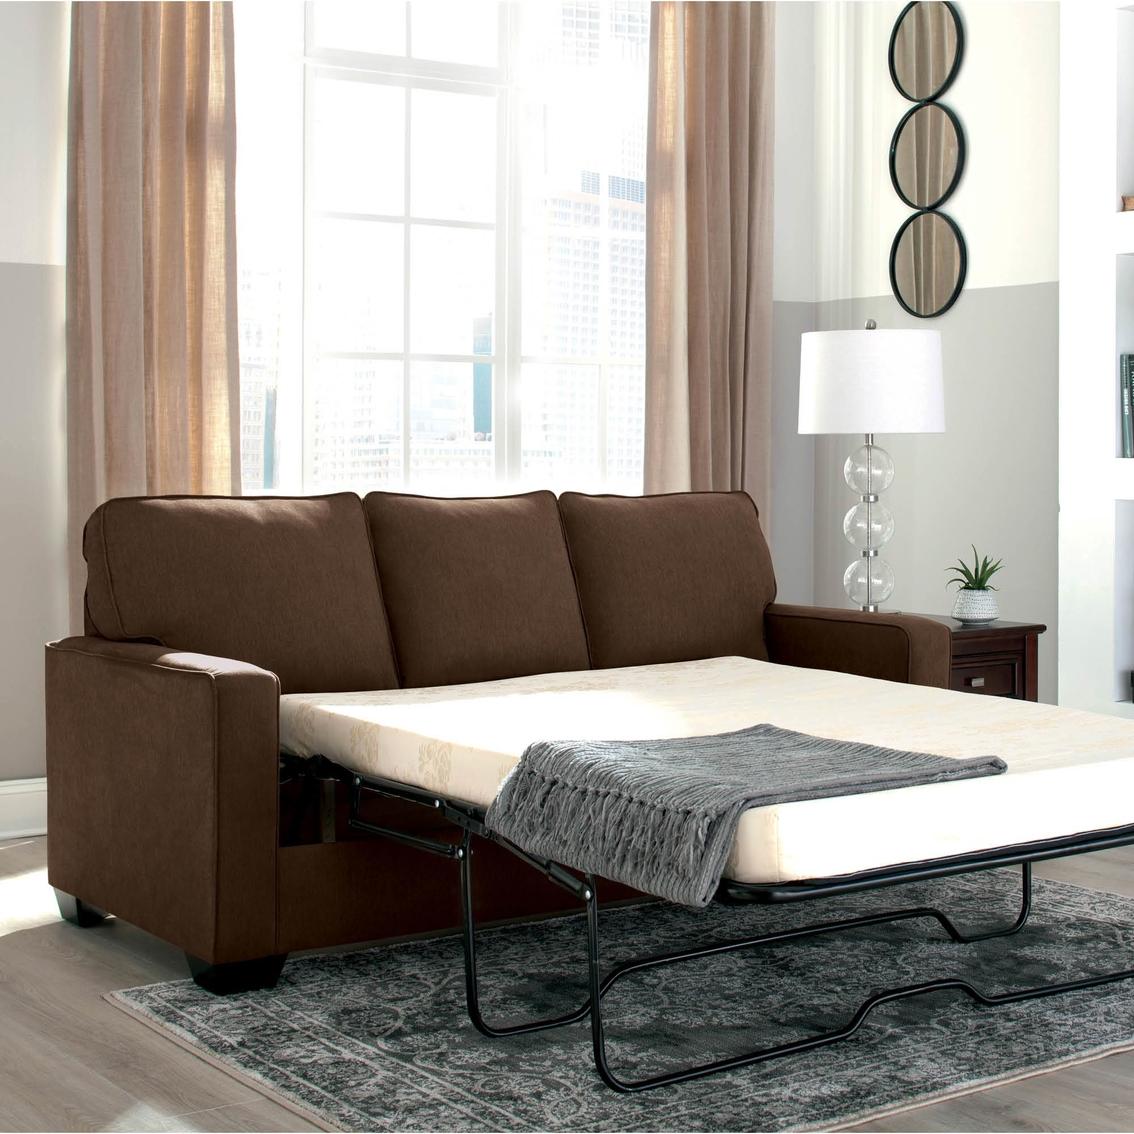 Signature Design By Ashley Zeb Full Sofa Sleeper Sofas